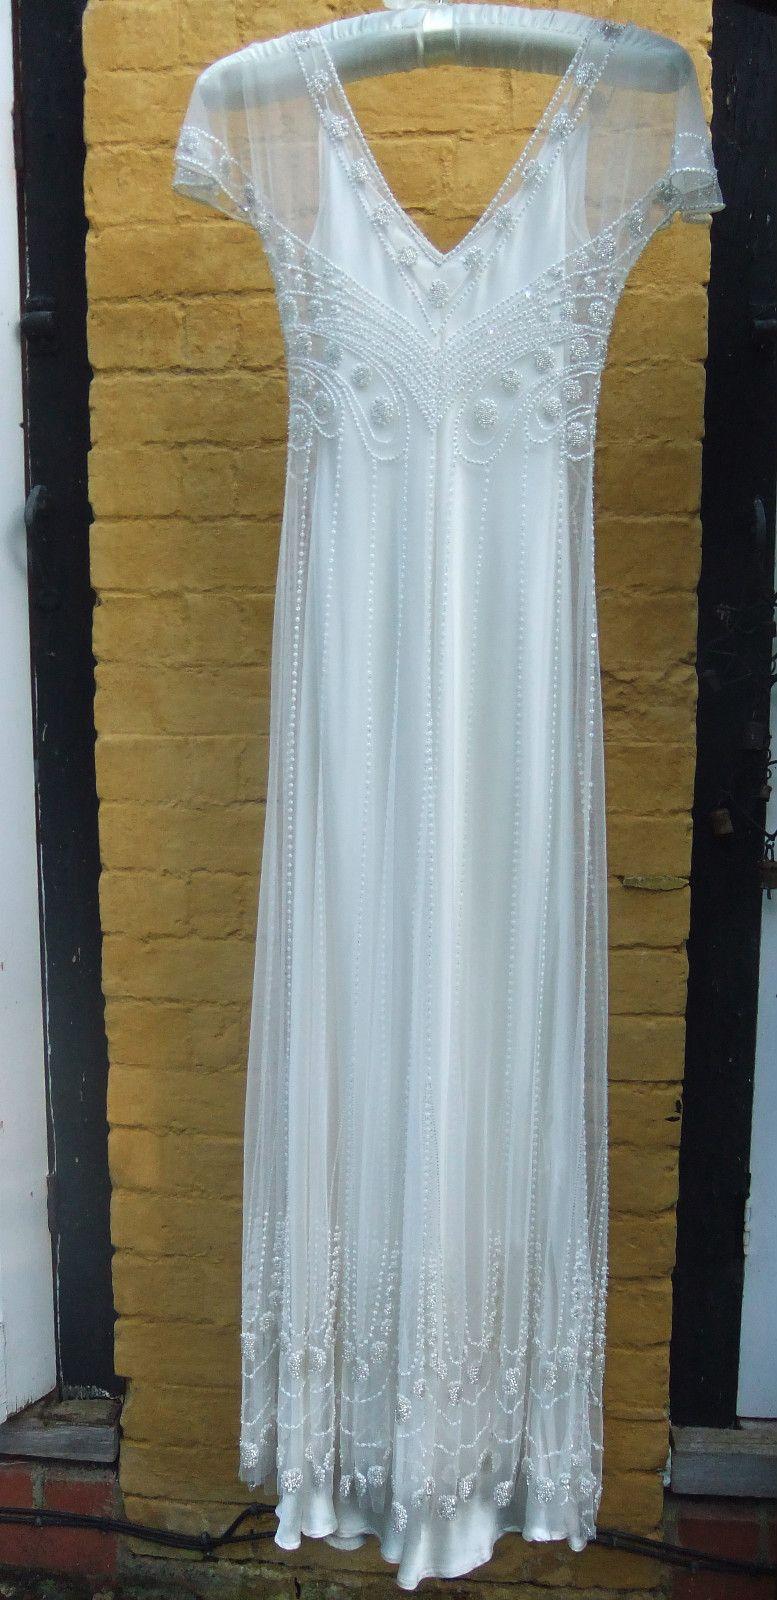 Jenny Packham Designer Wedding Dress Claire size 12 Vintage 1920s ...